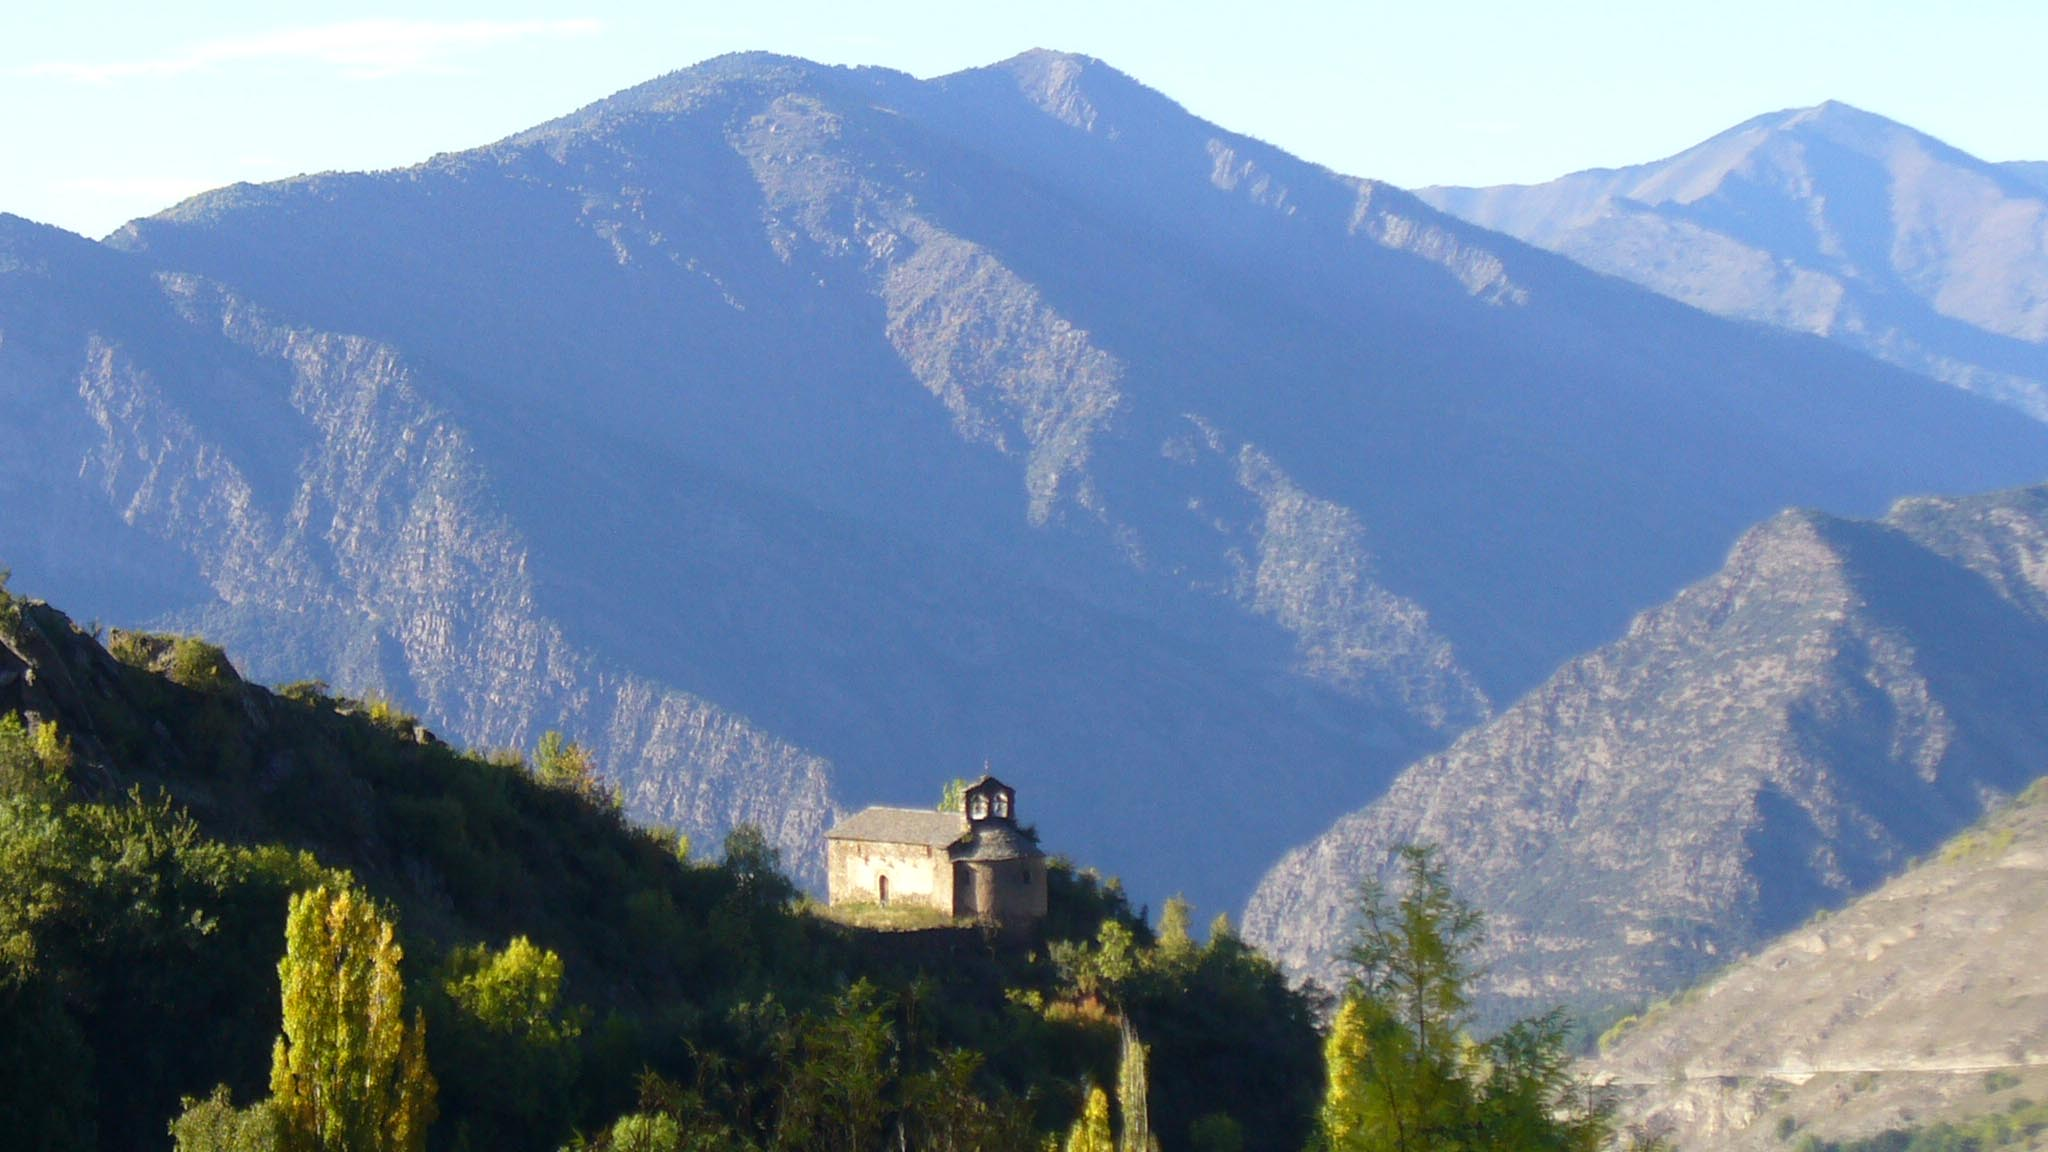 View of the Hermitage of Santa Eulalia d'Alendo from the Centre d'Art i Natura, Farrera, Catalan Pyrenees.